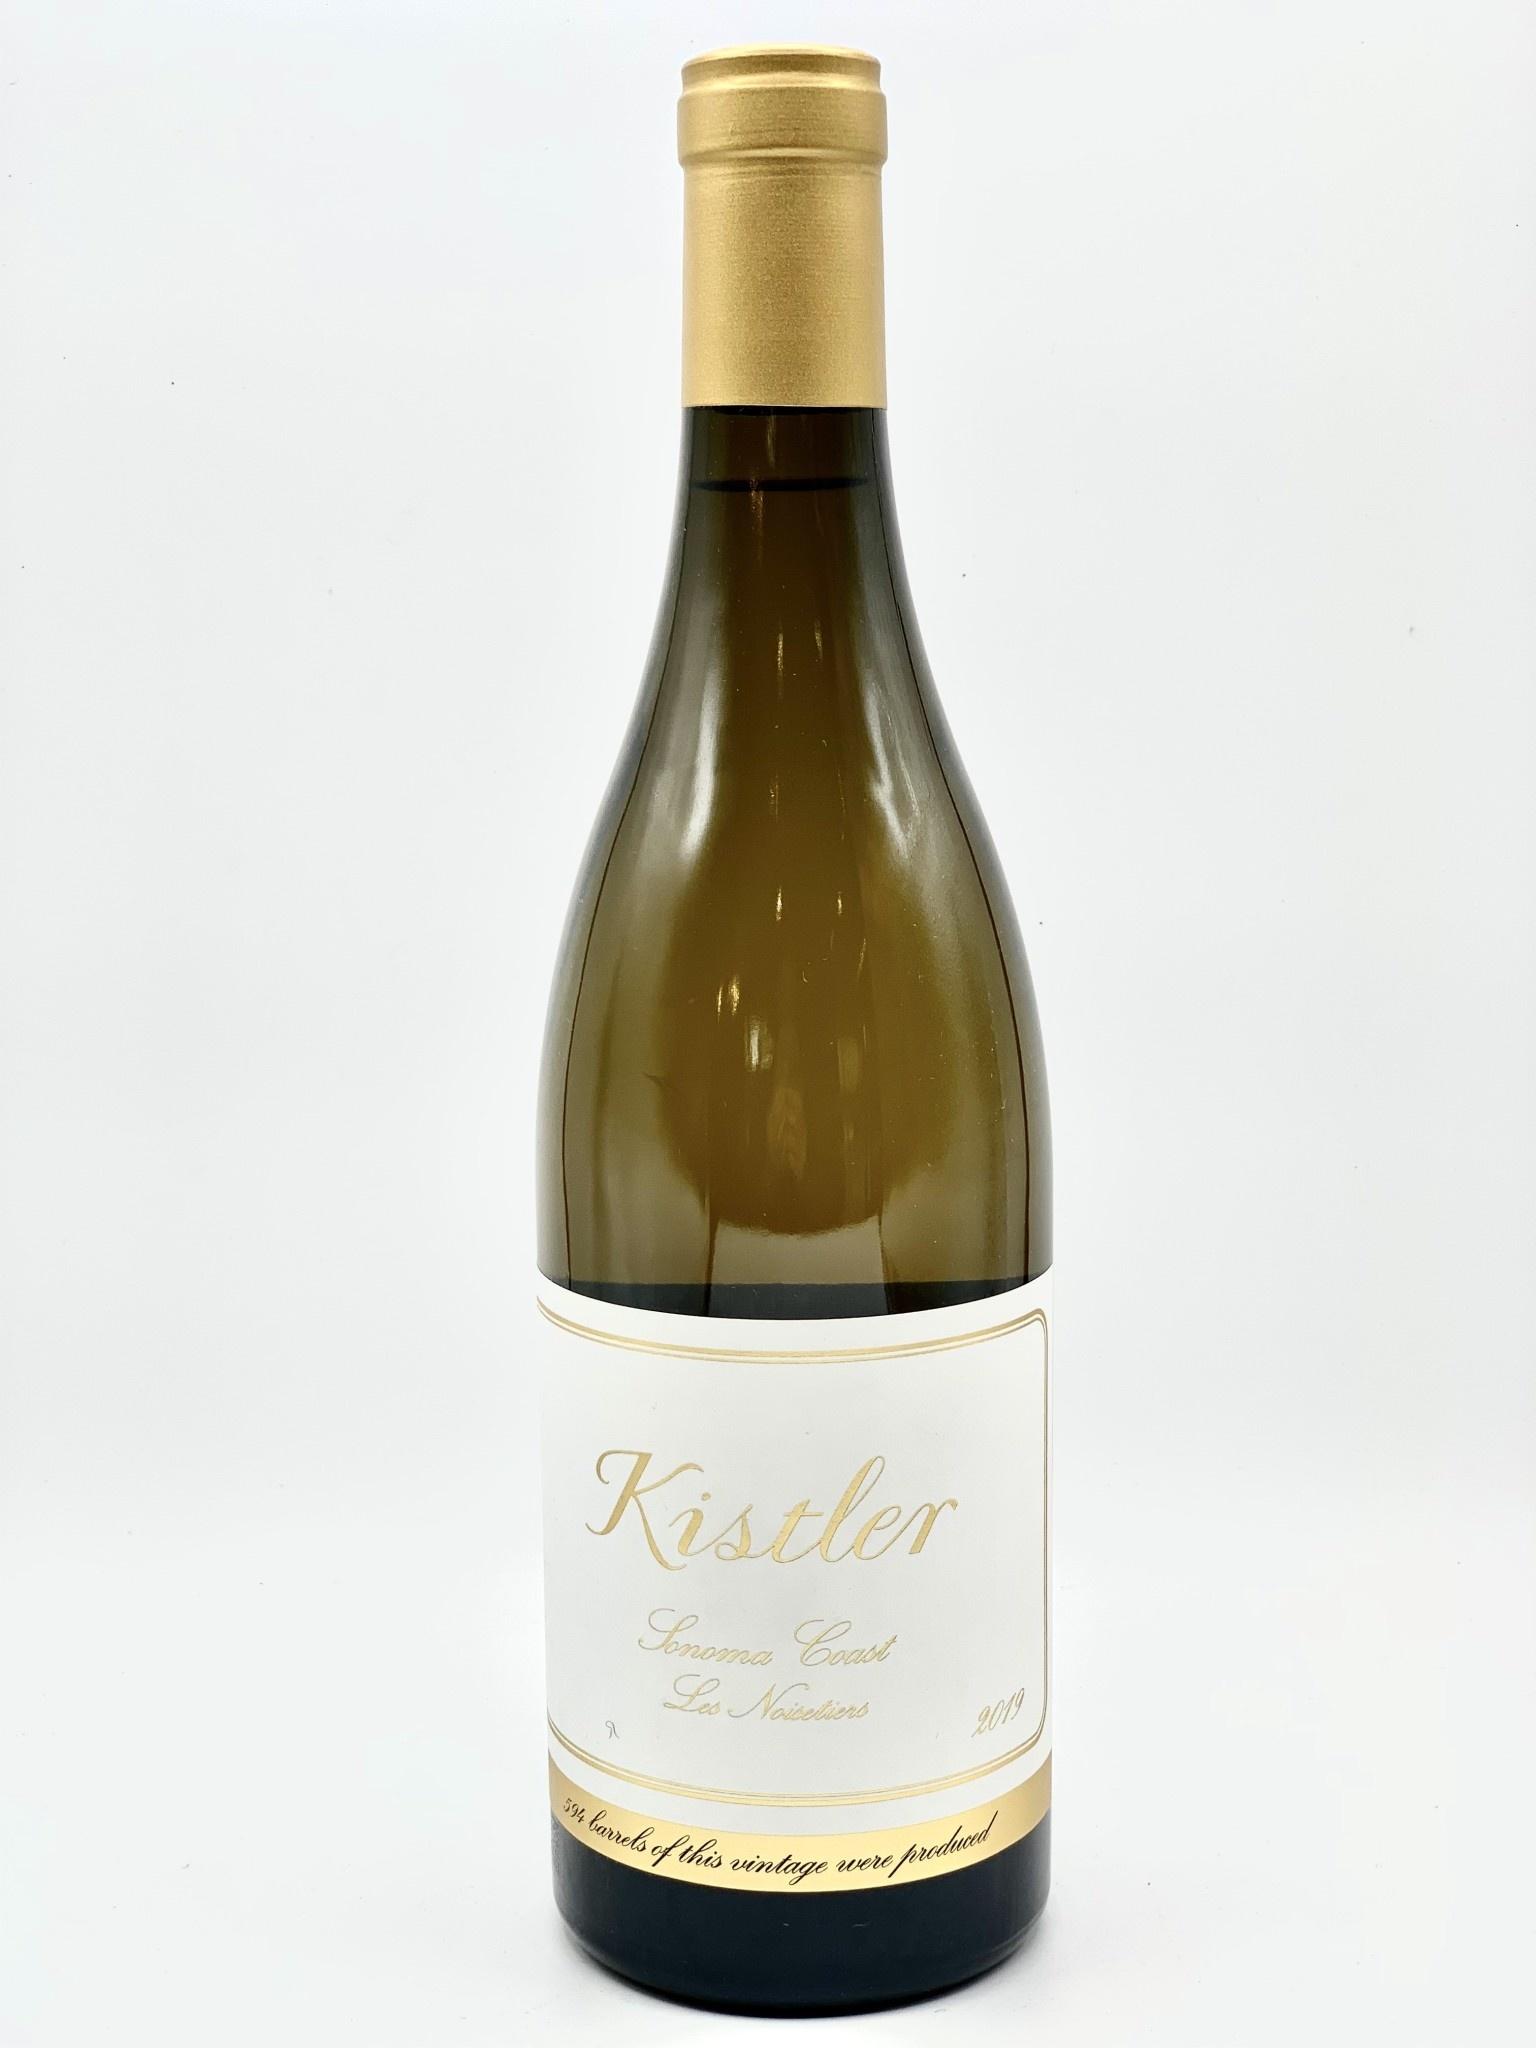 Sonoma Coast Chardonnay 2019 Kistler 'Les Noisetiers' 750ml